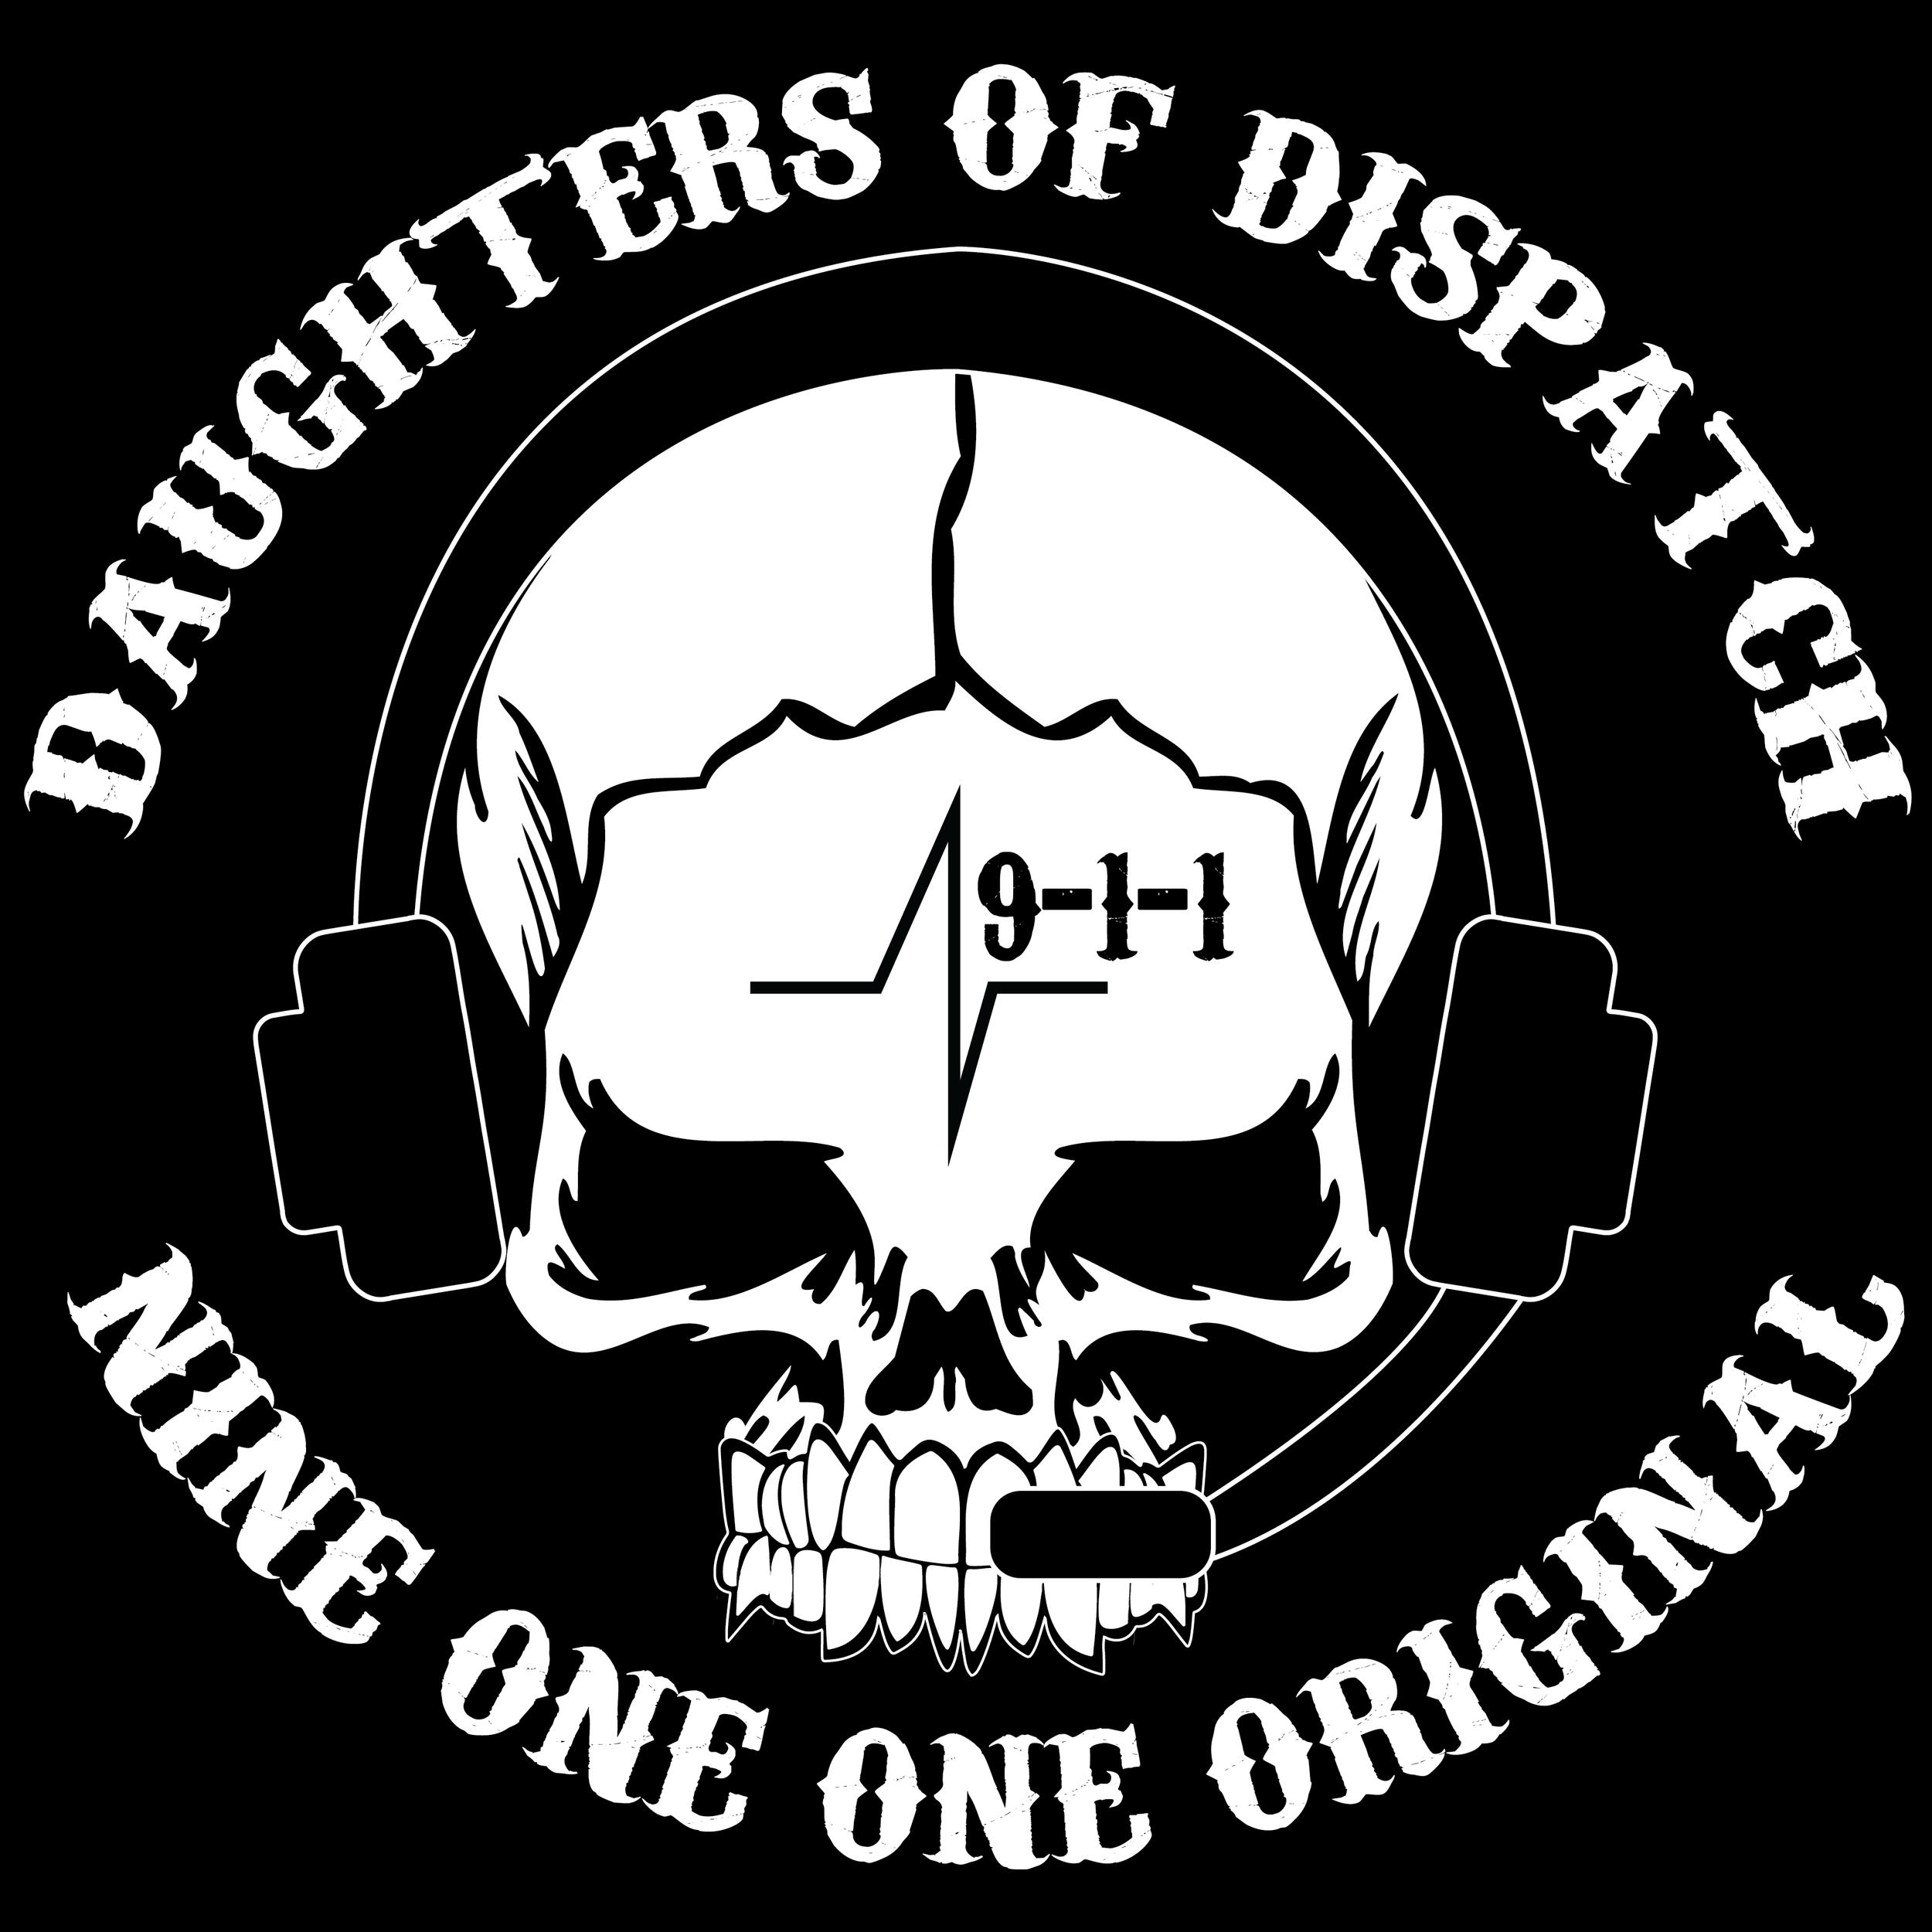 daughtersofdispatch2.png